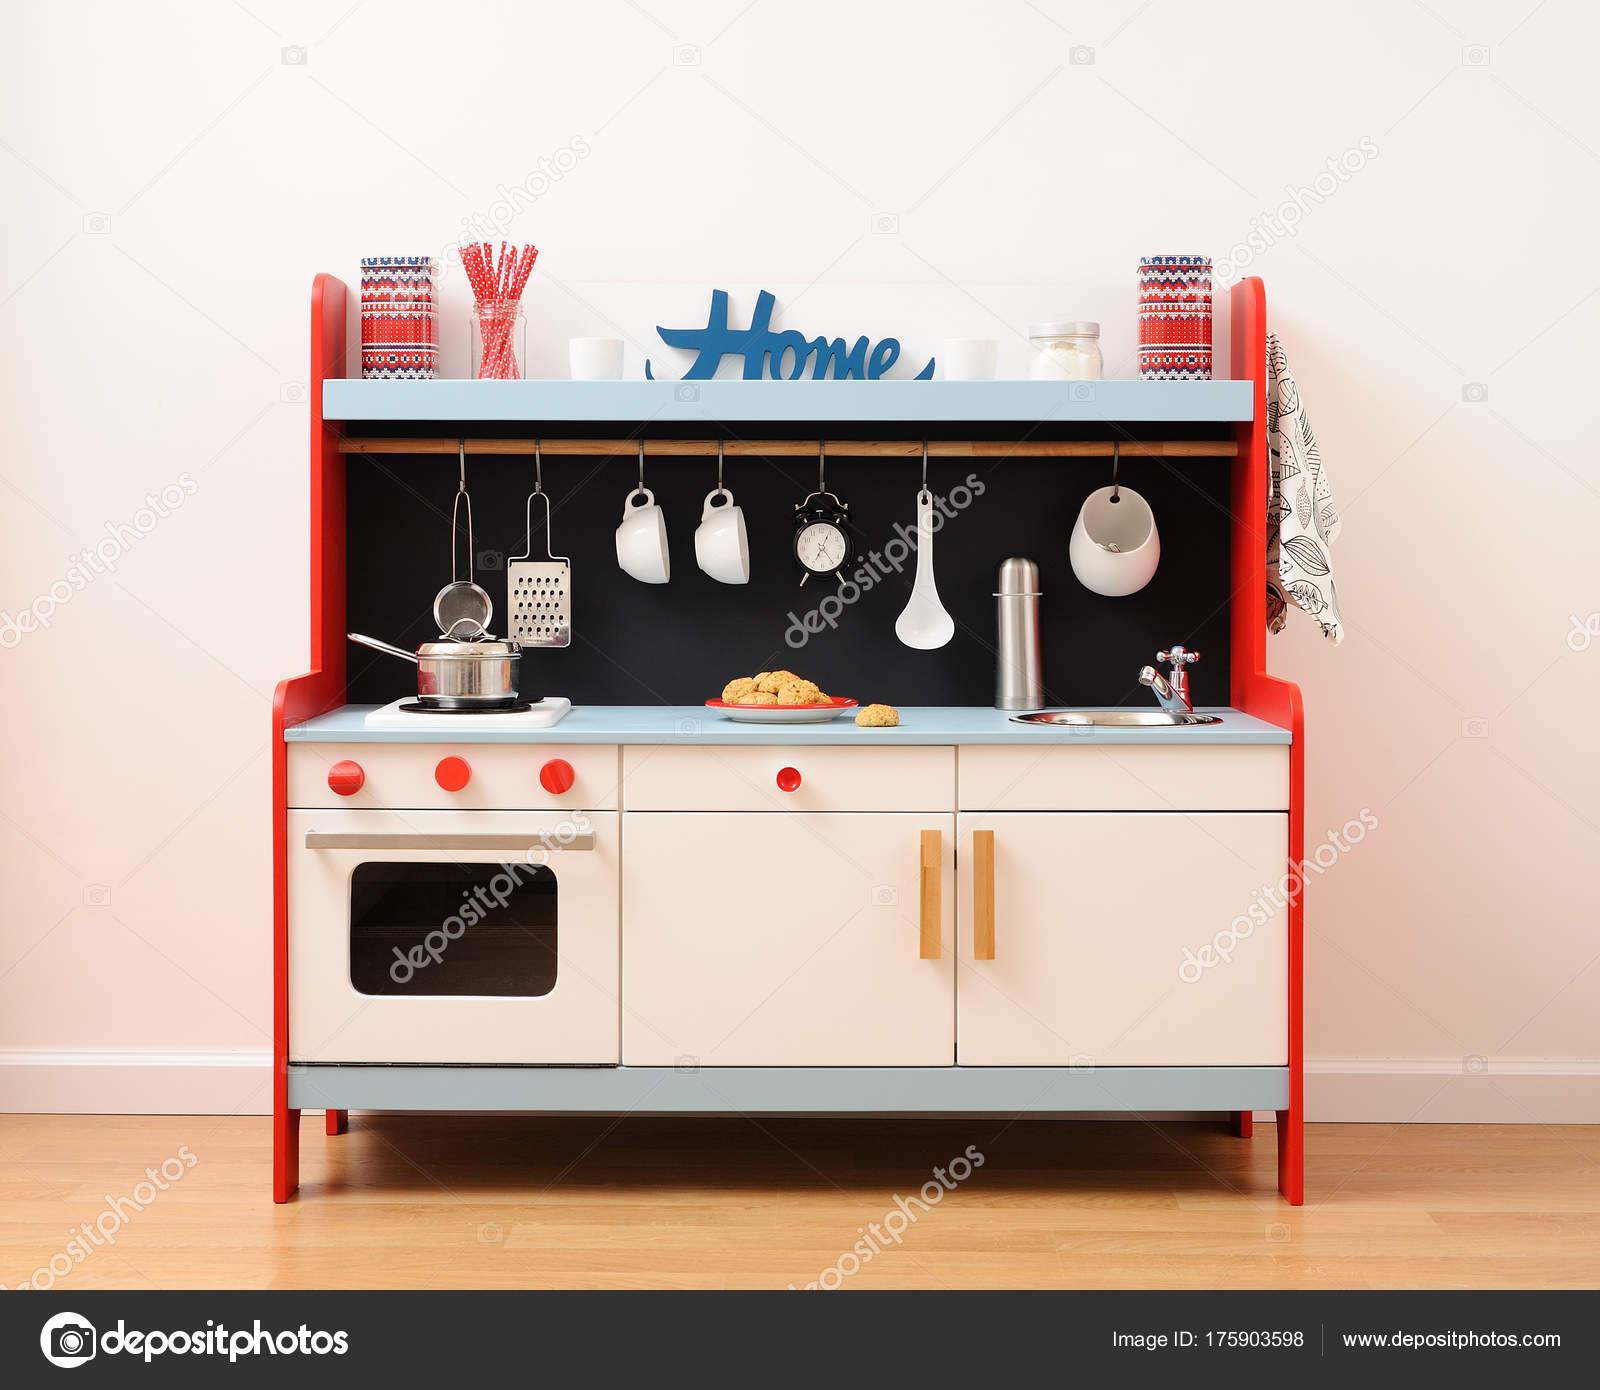 kitchen prep sink 19x33 时尚的玩具厨房配有烤箱 抽屉 炉灶和水槽 配有餐具准备好玩 图库照片 配有